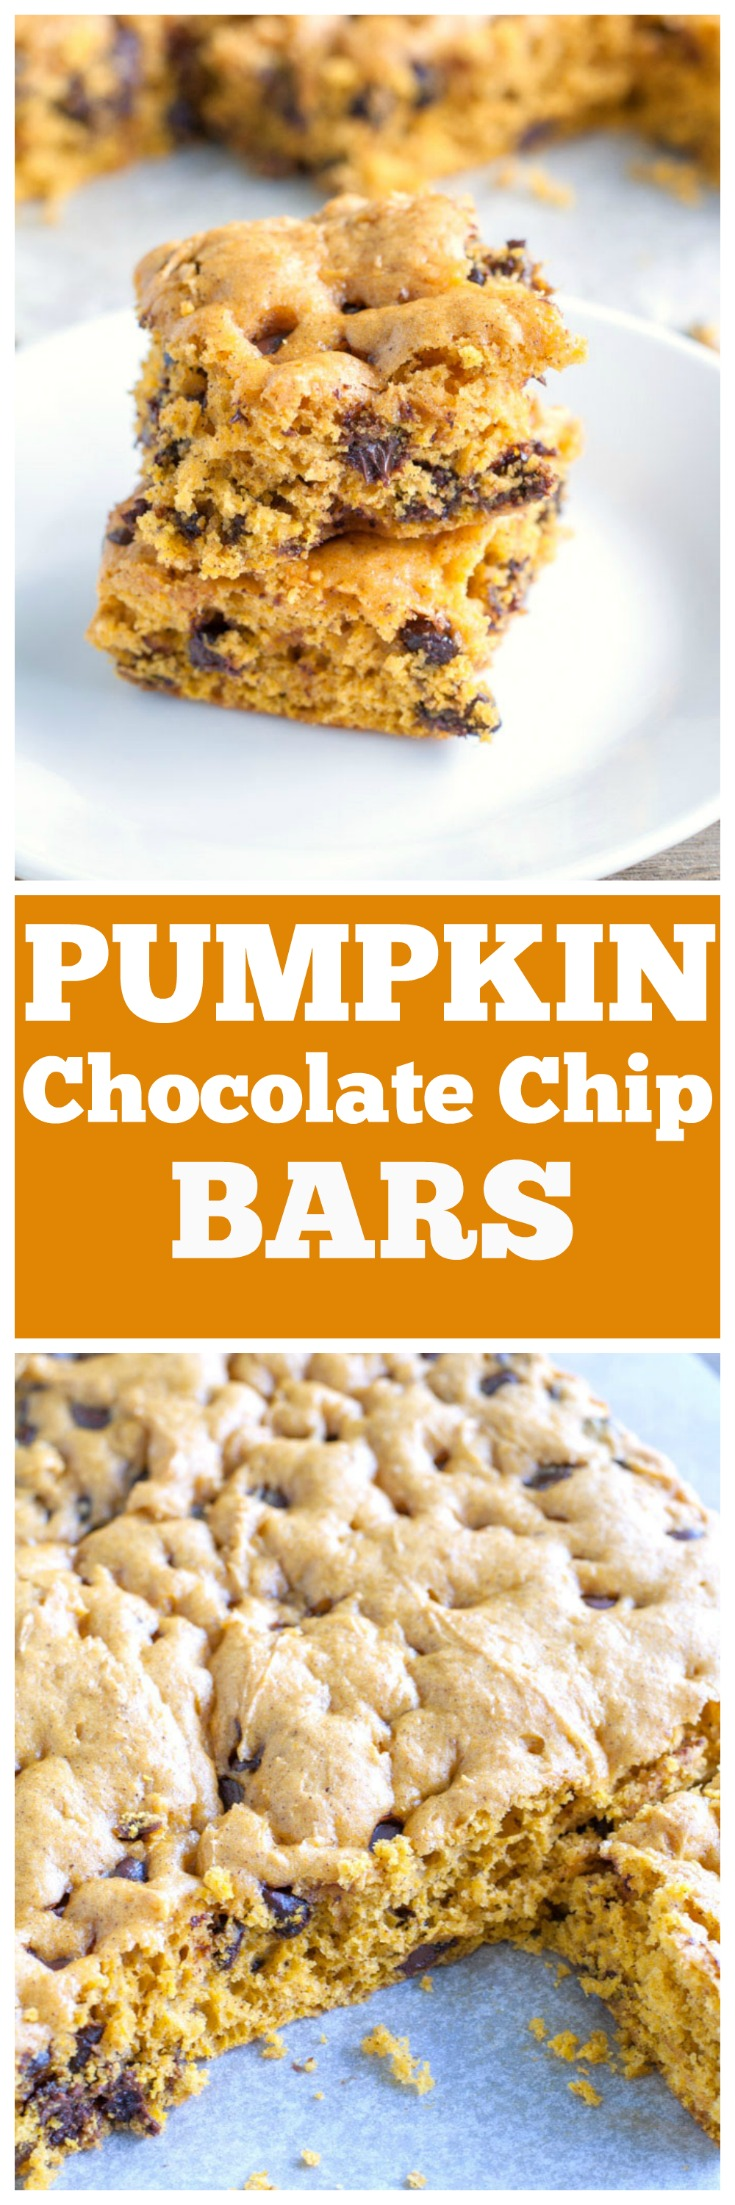 Pumpkin Yellow Cake Bars With Chocolate Chips